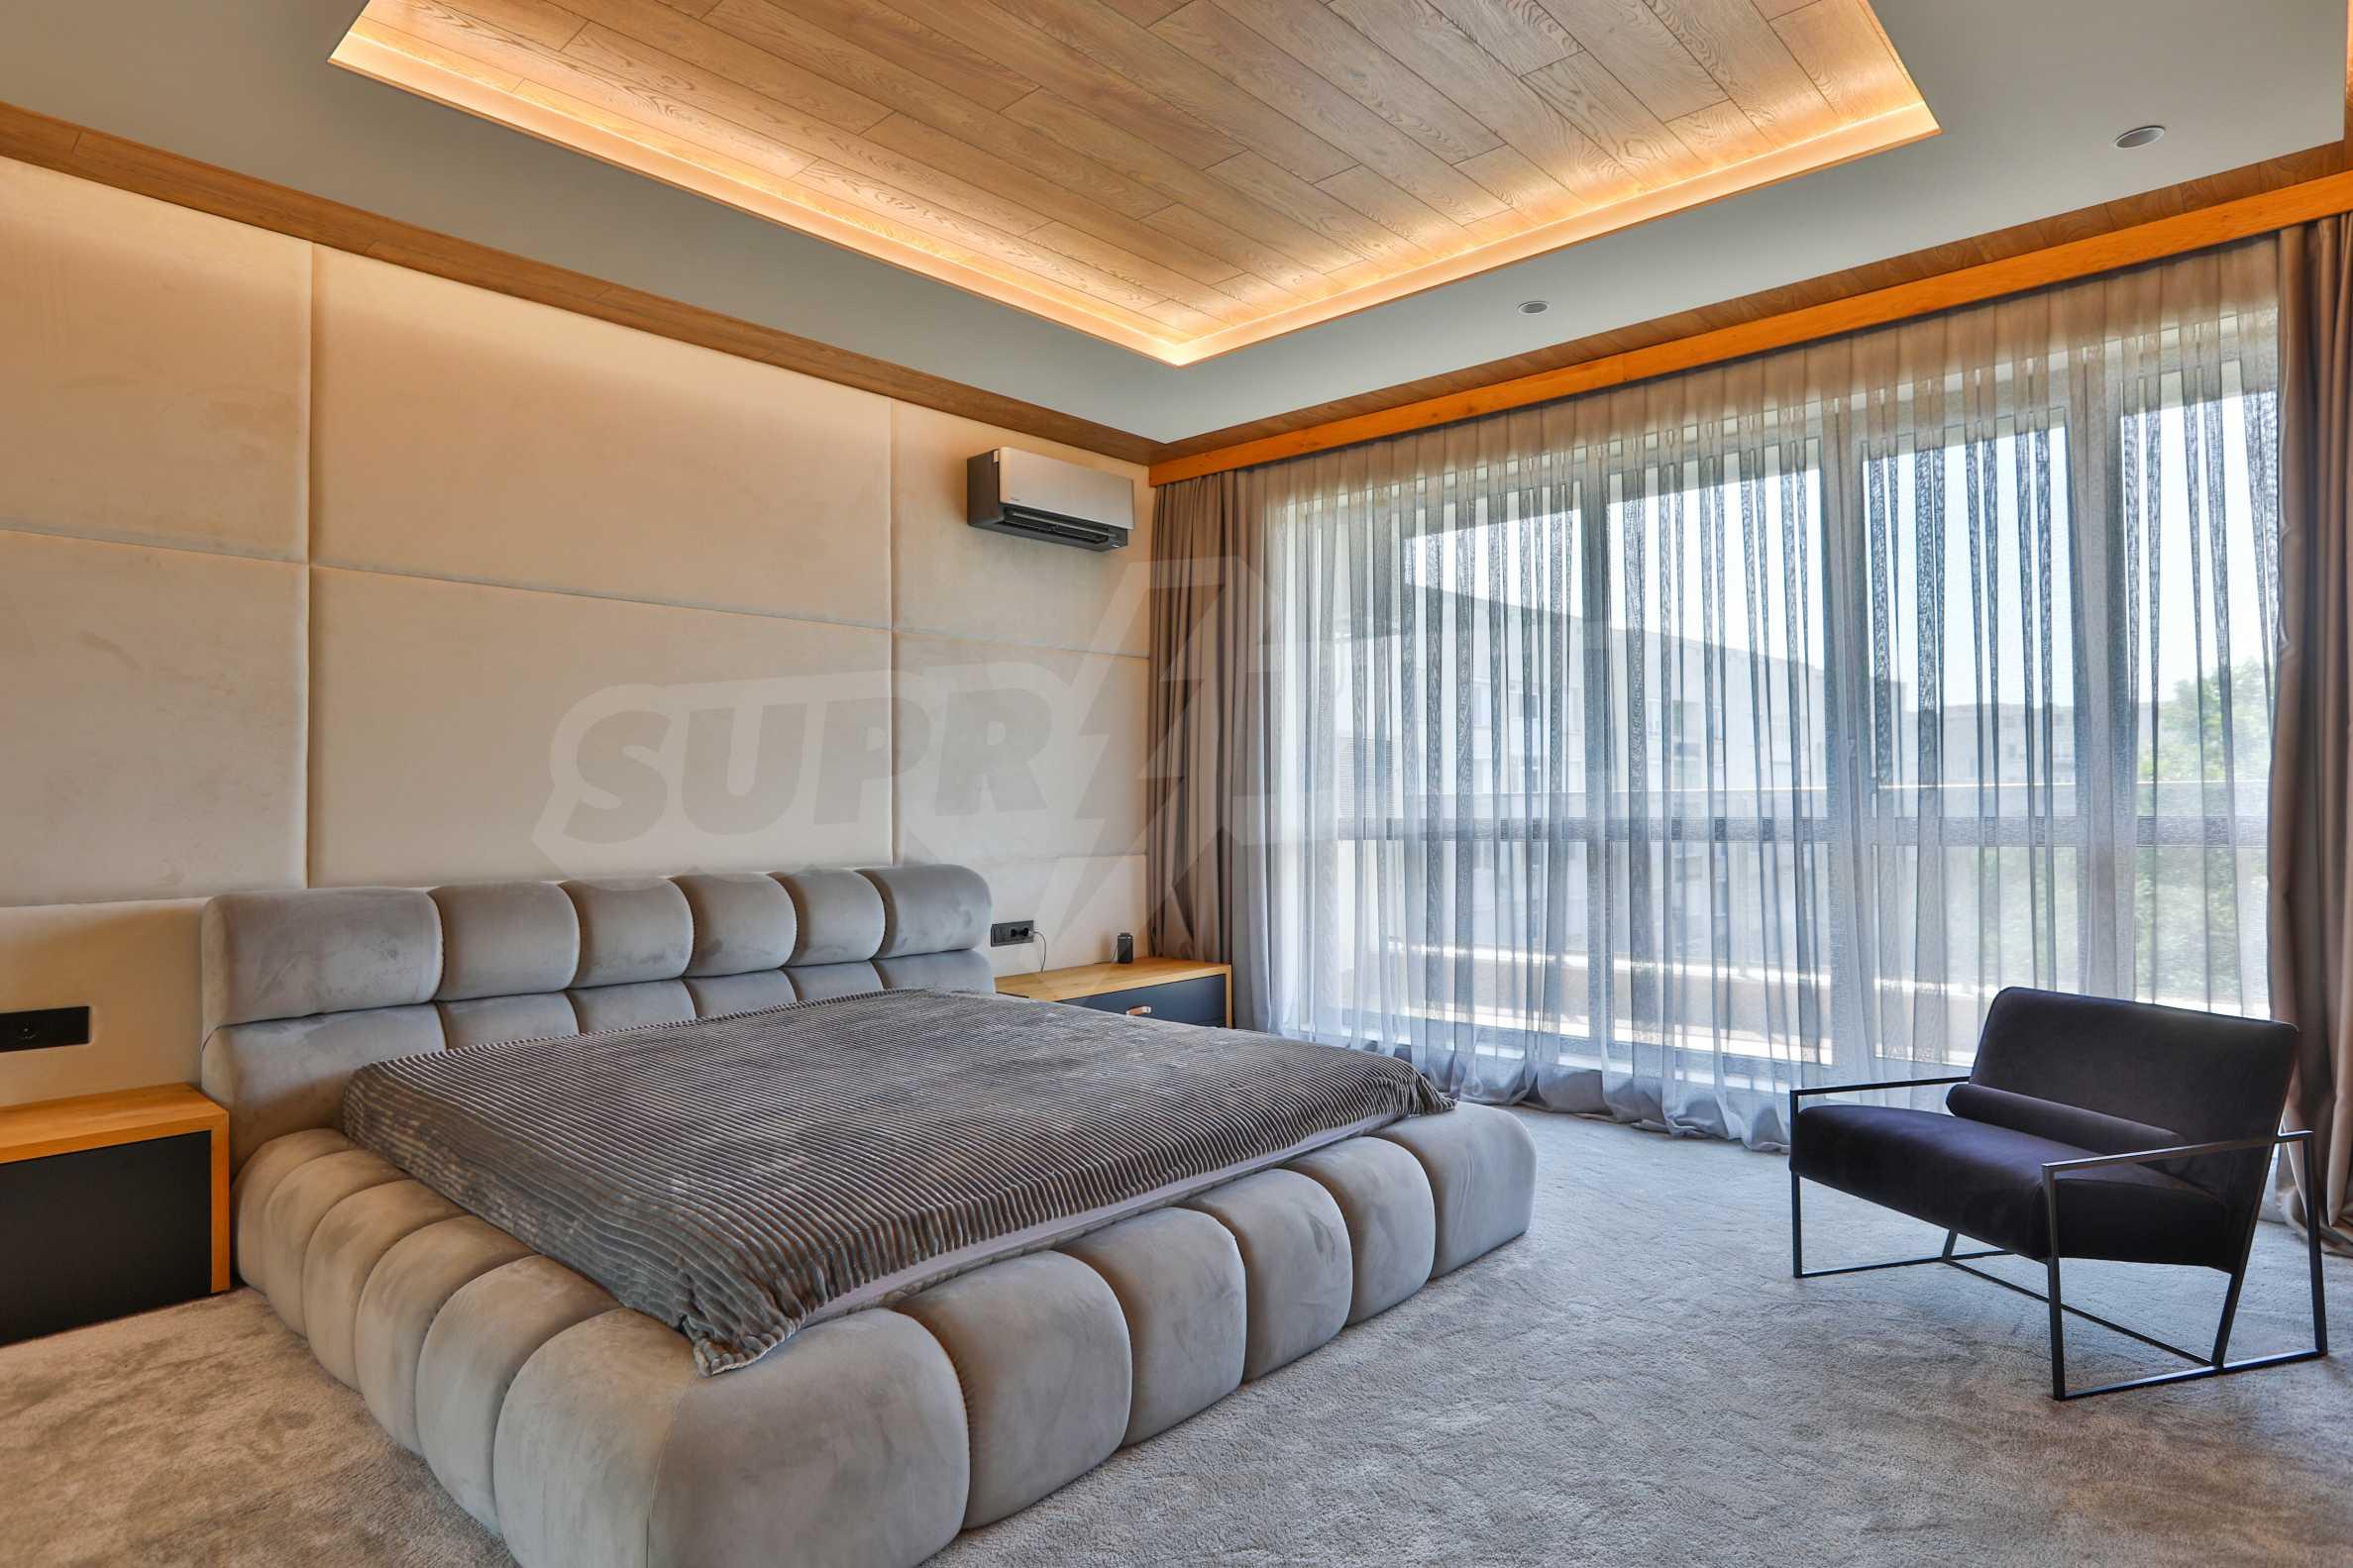 Дизайнерски обзаведен многостаен апартамент 8